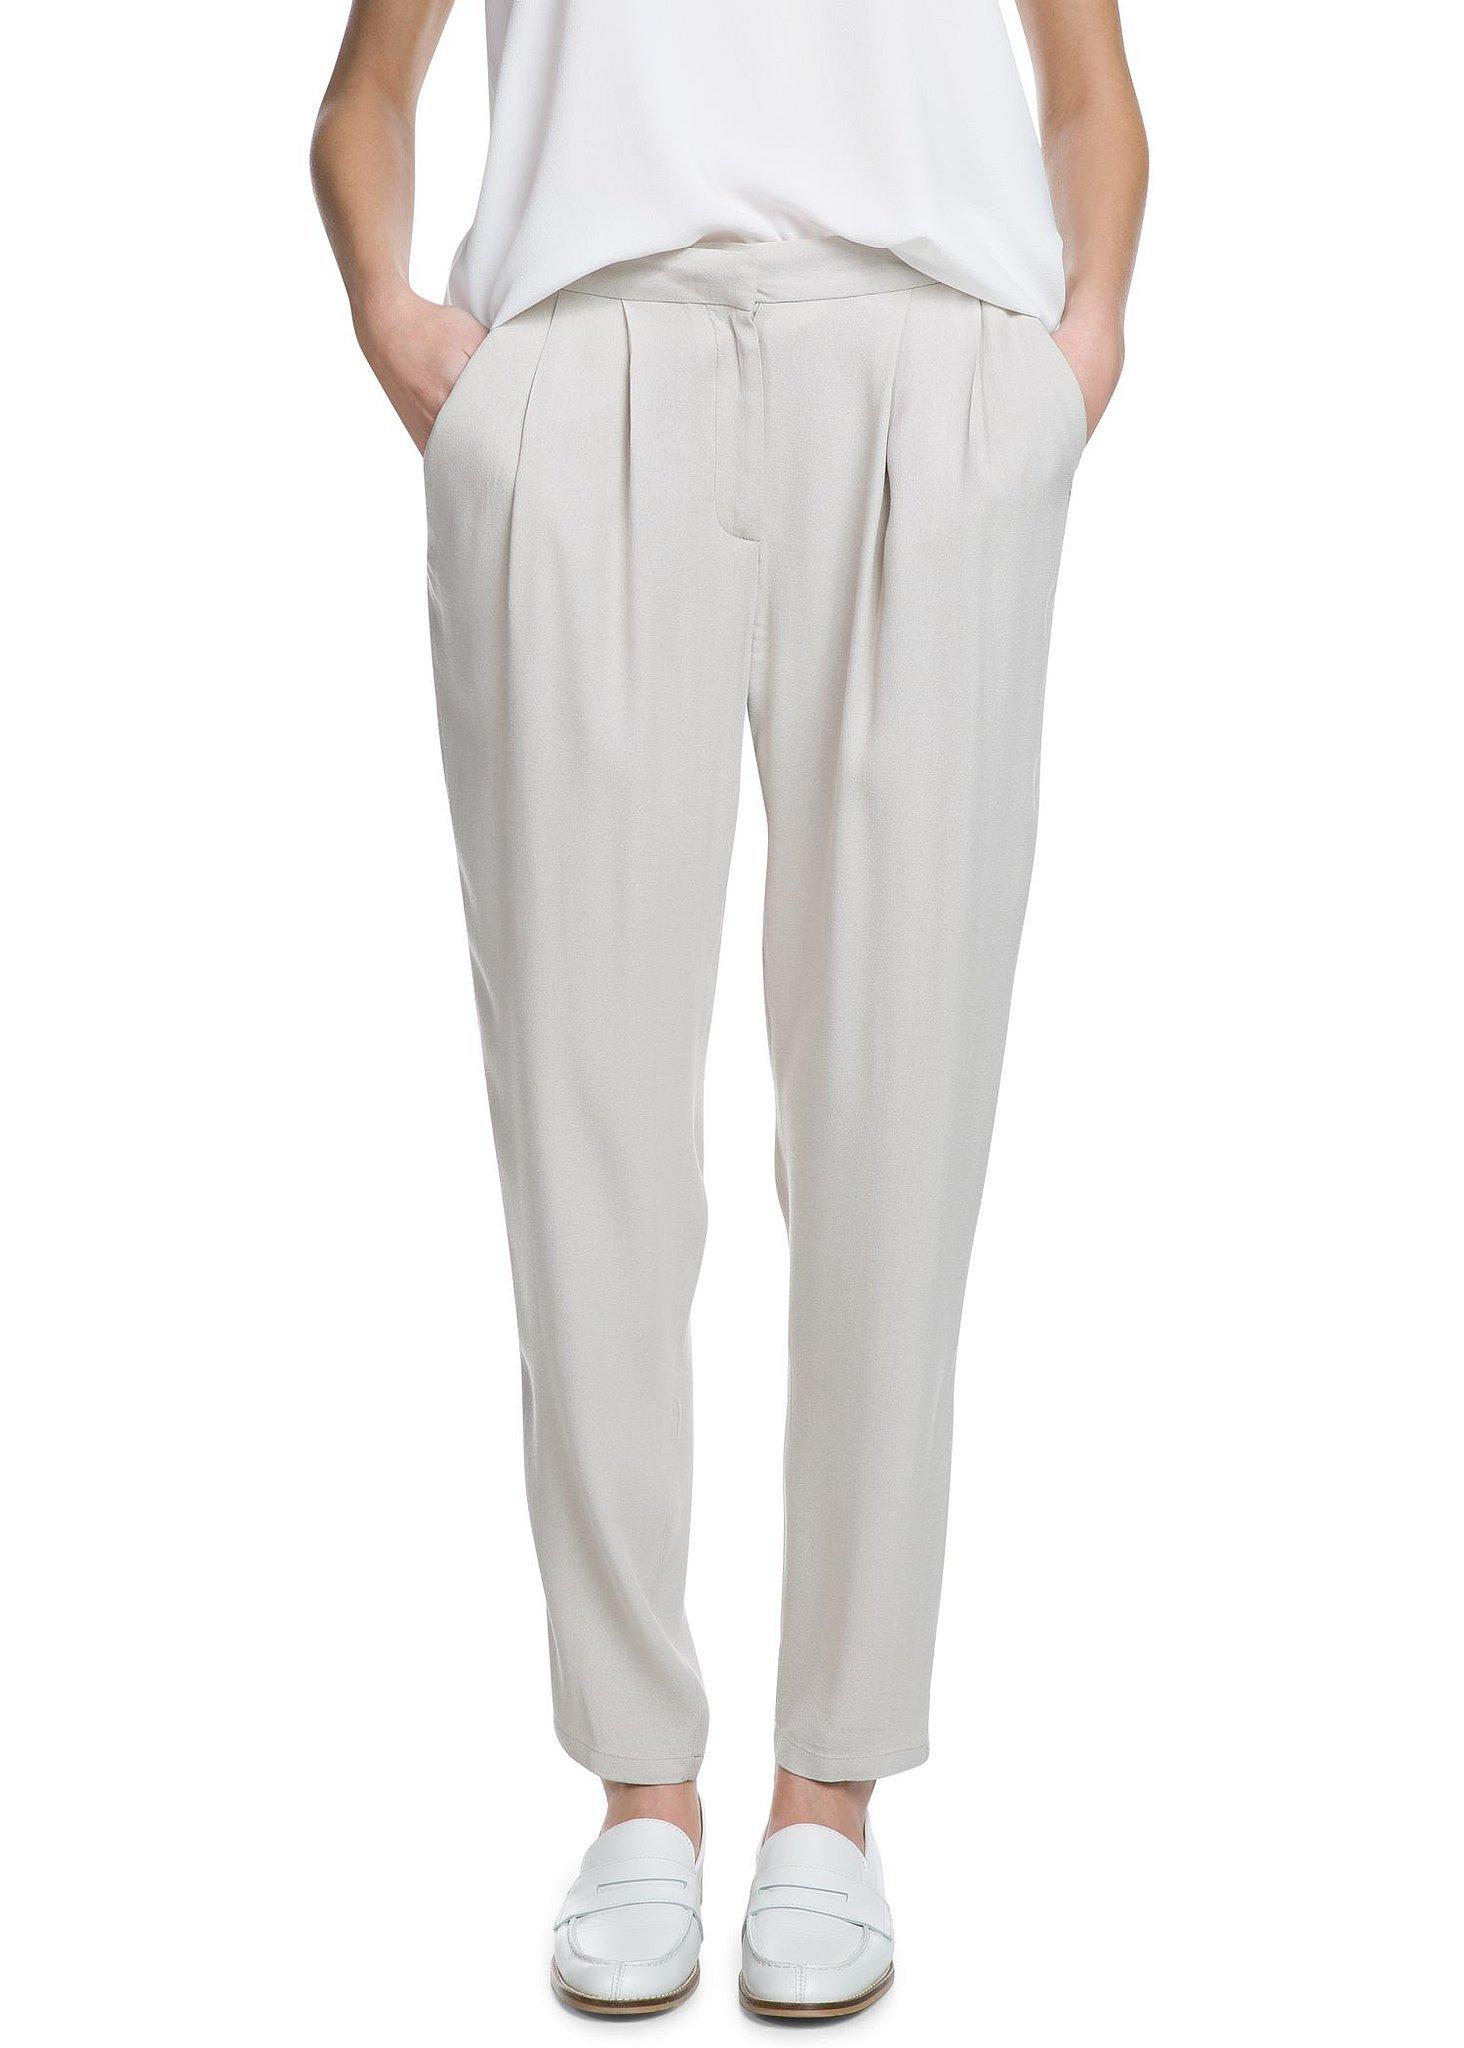 Mango White Crepe Baggy Trousers ($45)